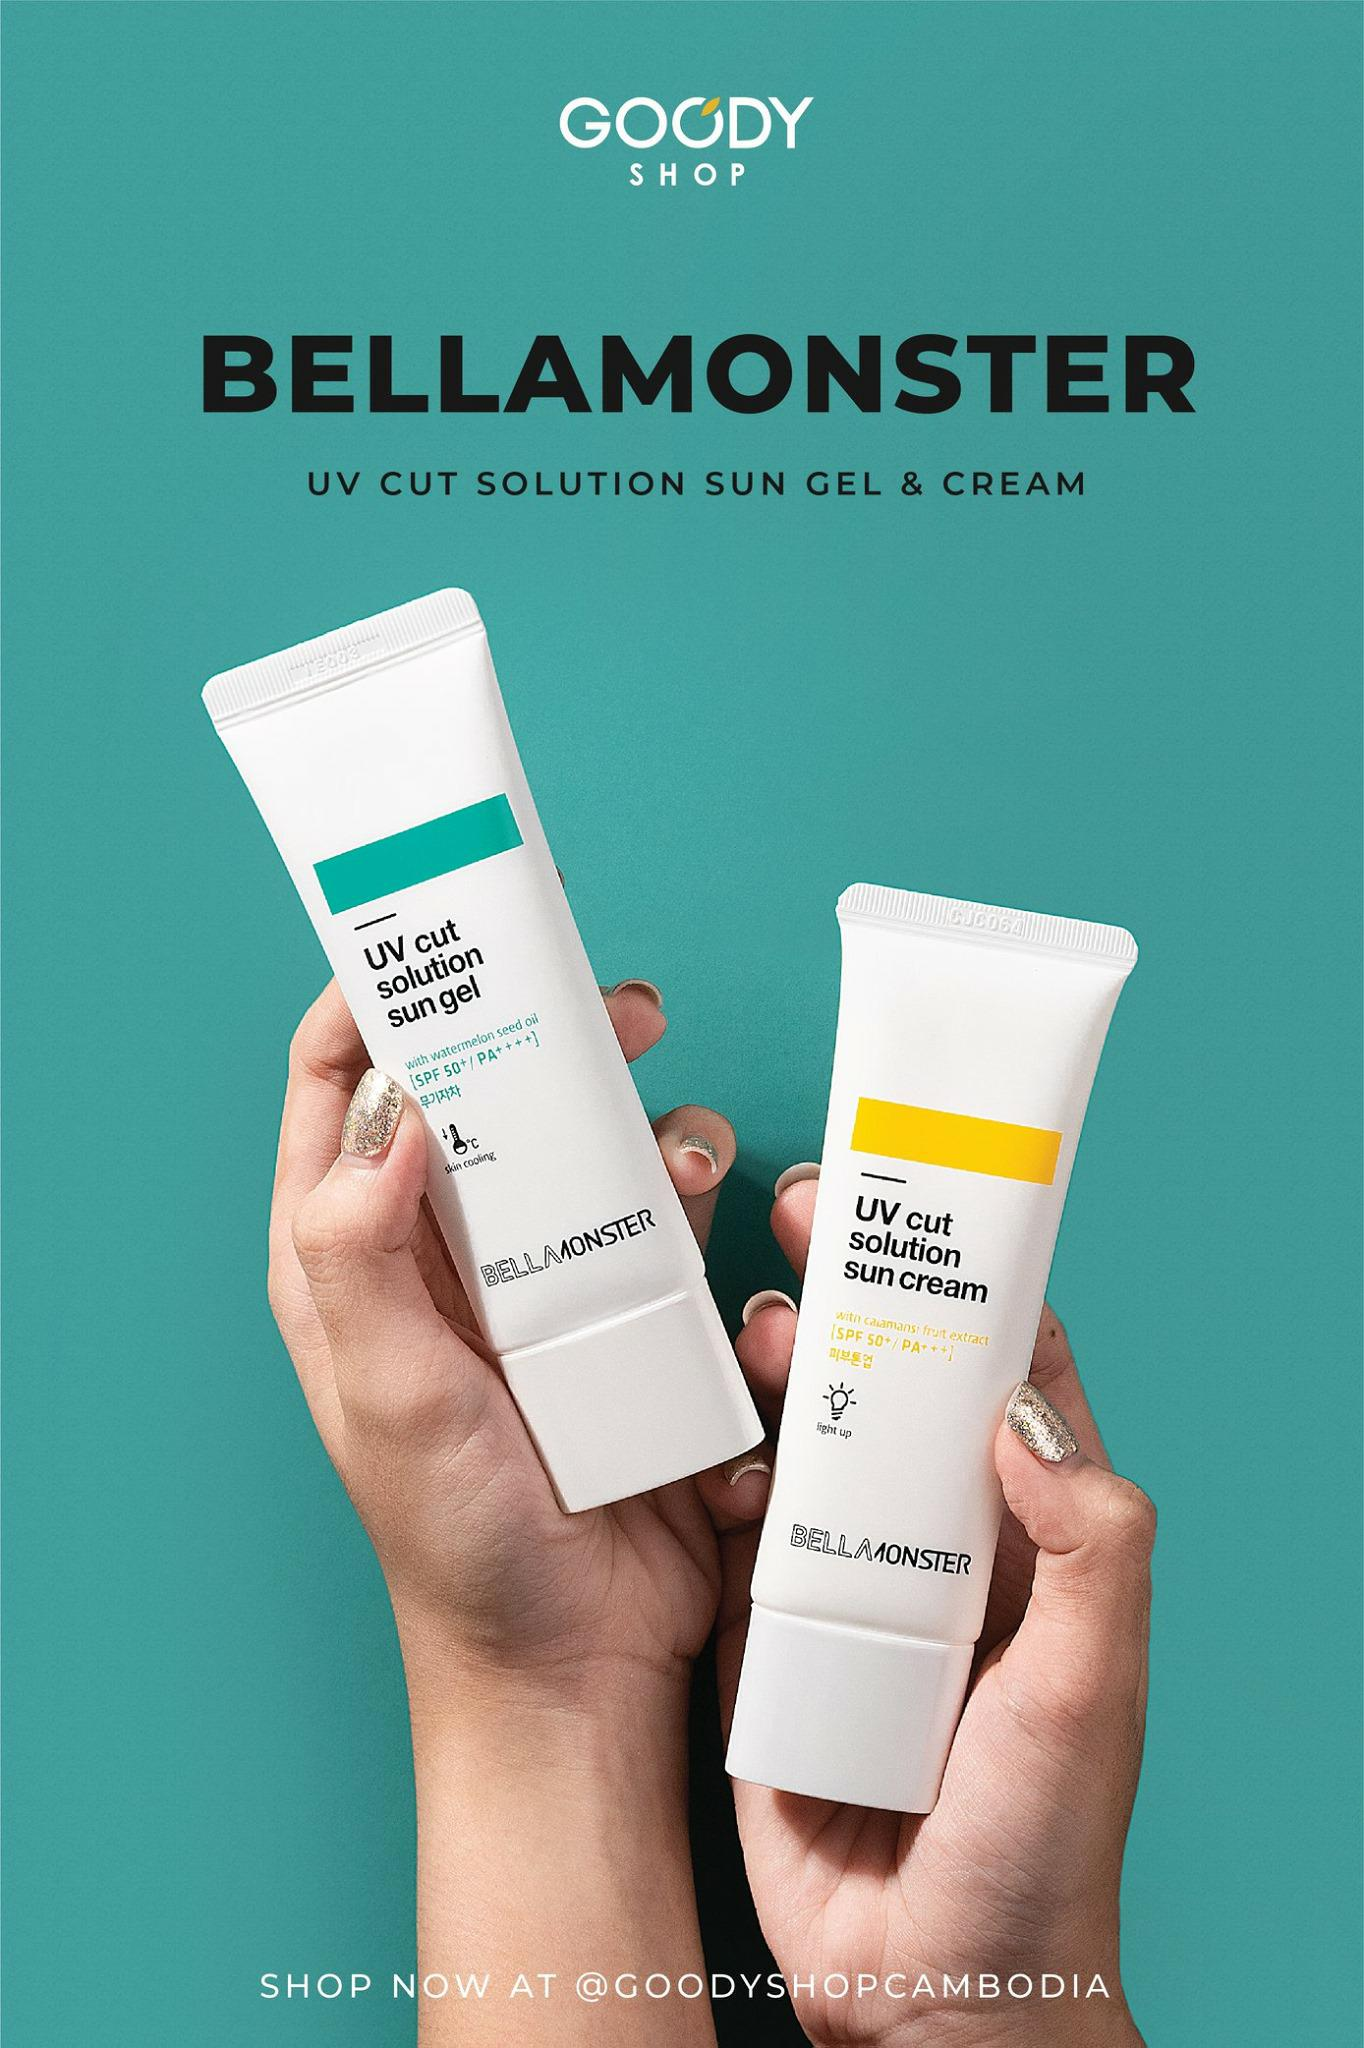 Bellamonster UV Cut Solution Sun Gel